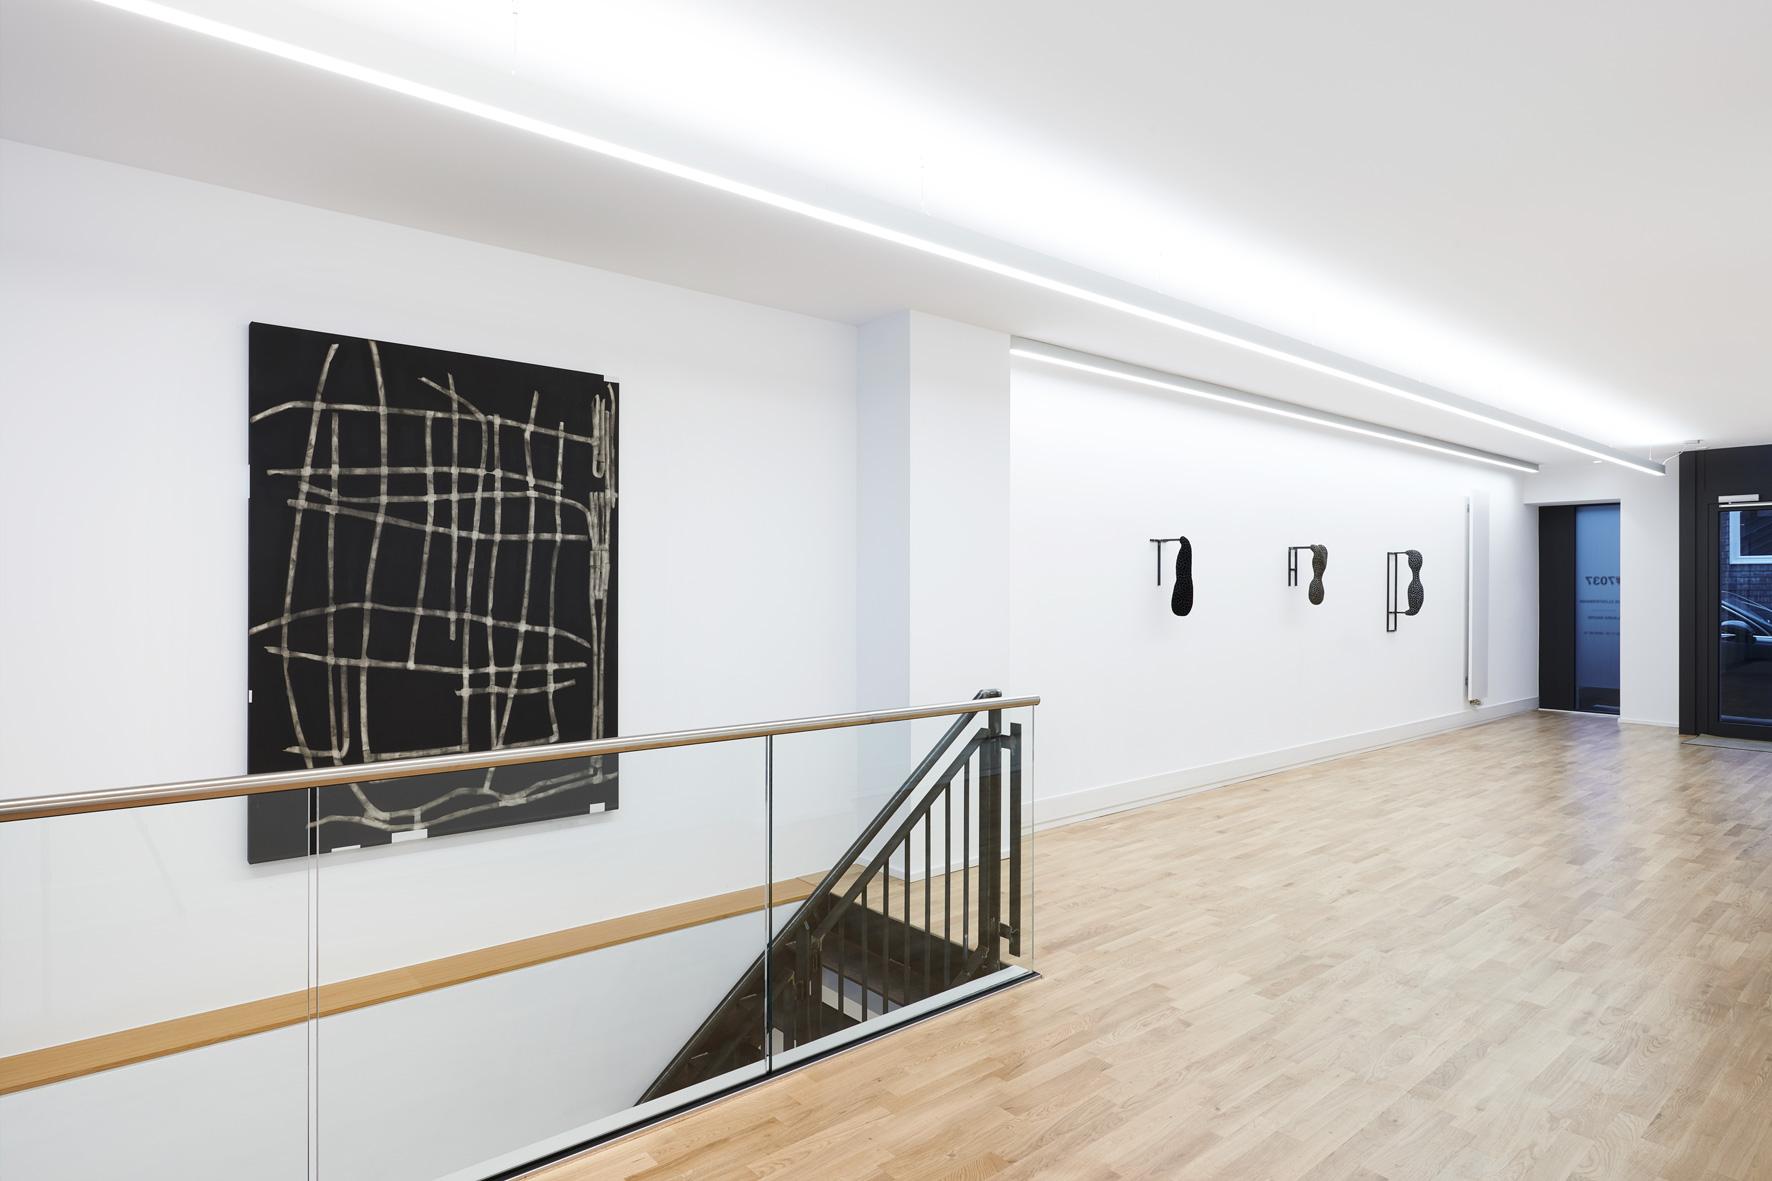 2019.01.08_Galerie-Alber-21_Mareike Tocher_.web.jpg